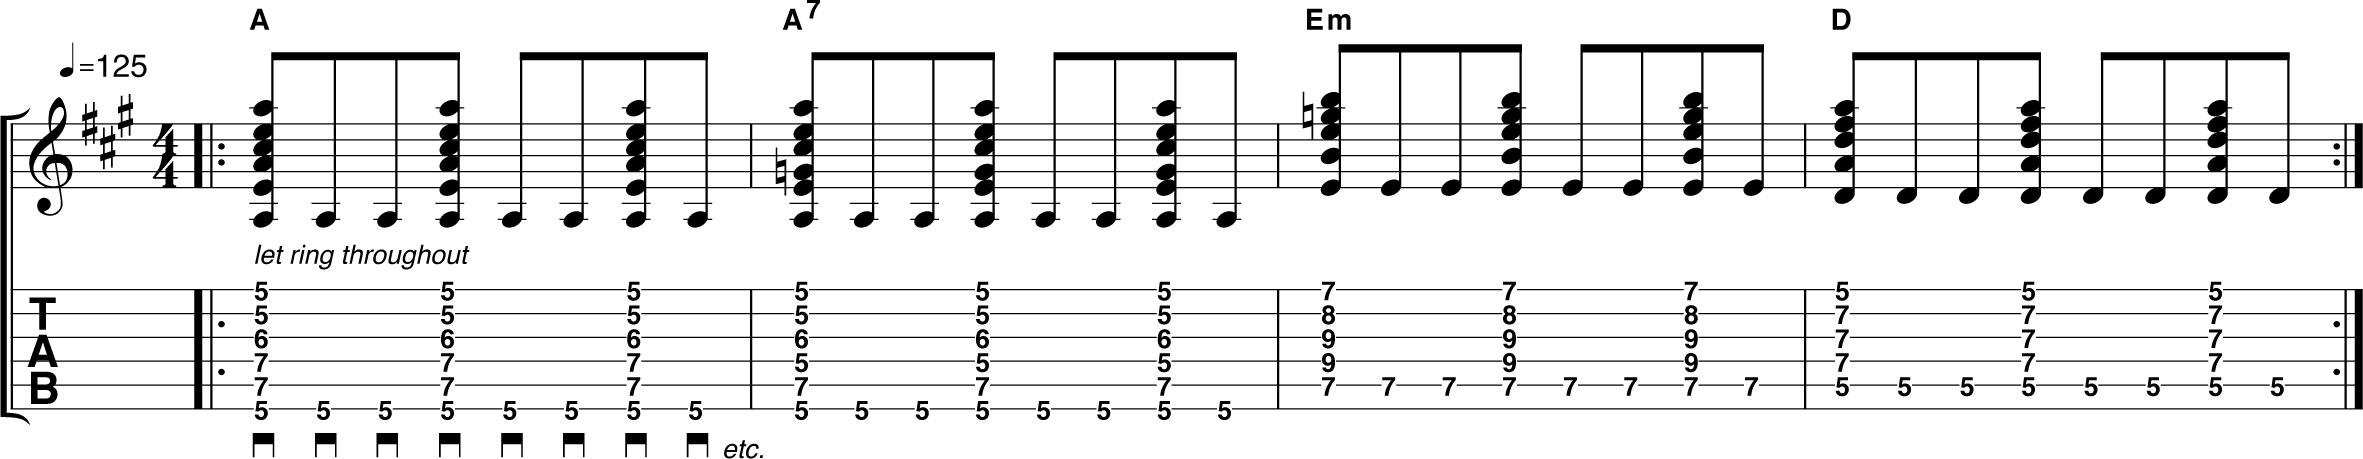 fig5-tab